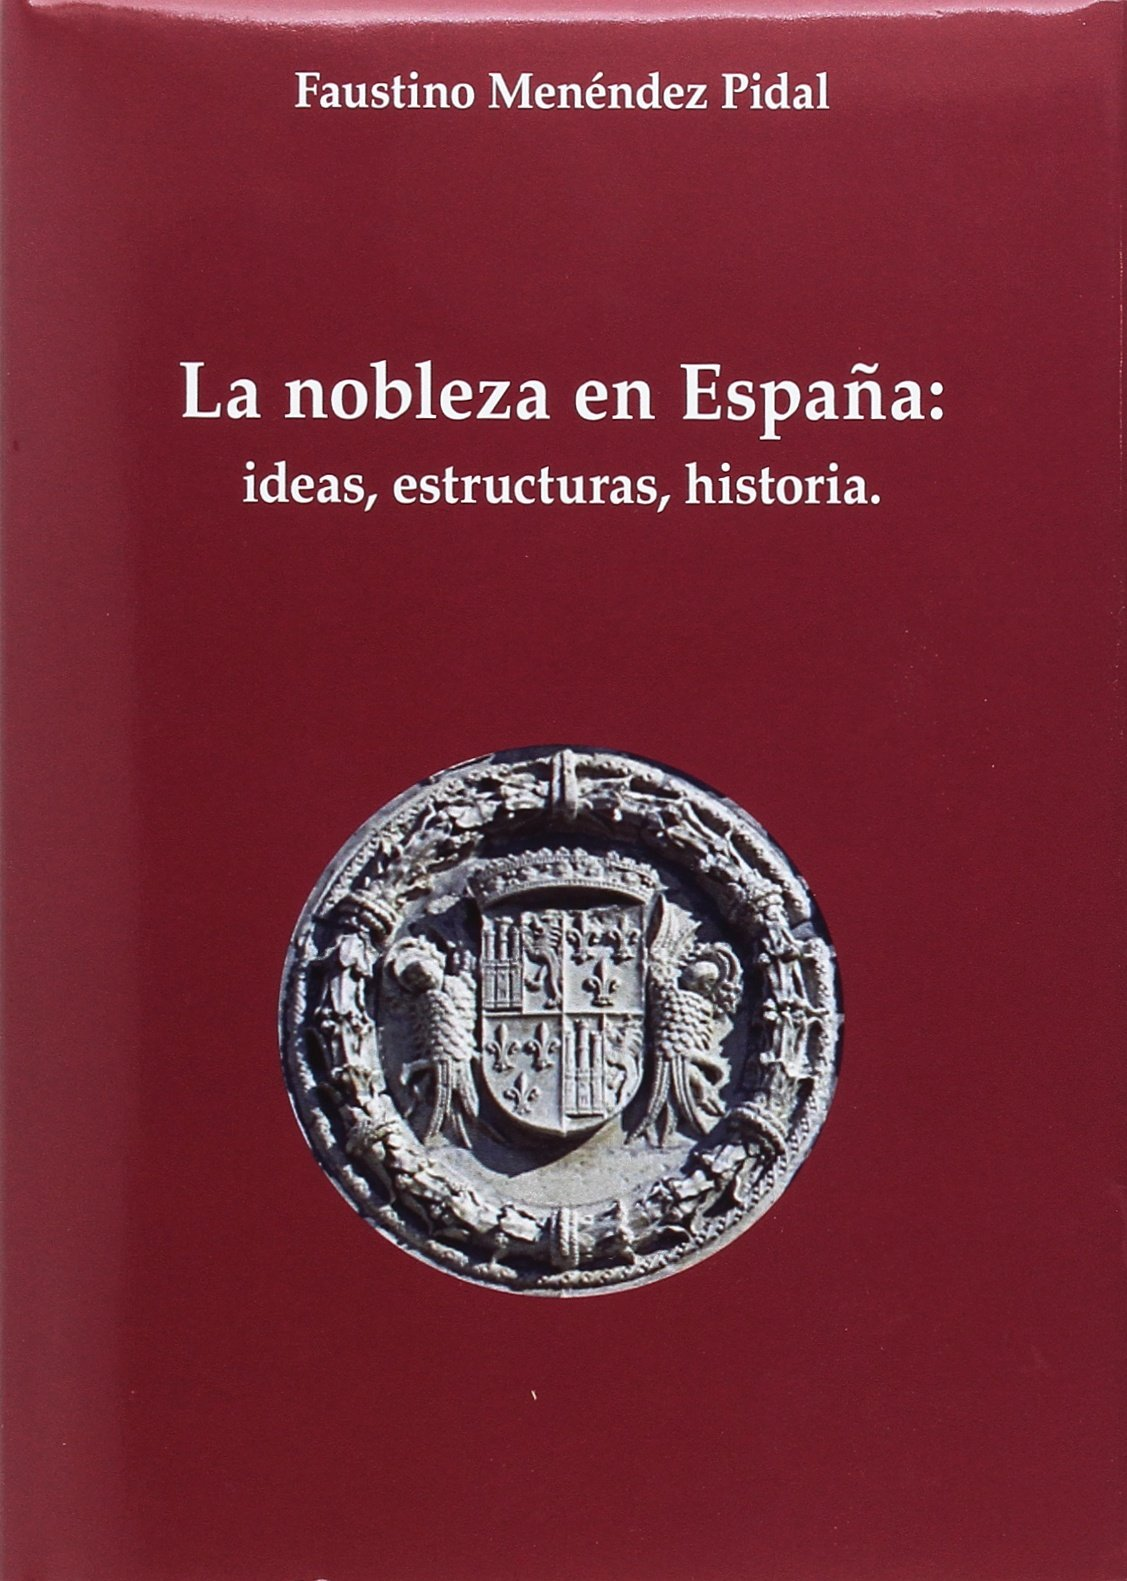 La nobleza en España: Ideas, estructura, historia: Amazon.es: Menéndez-Pidal de Navascués, Faustino: Libros